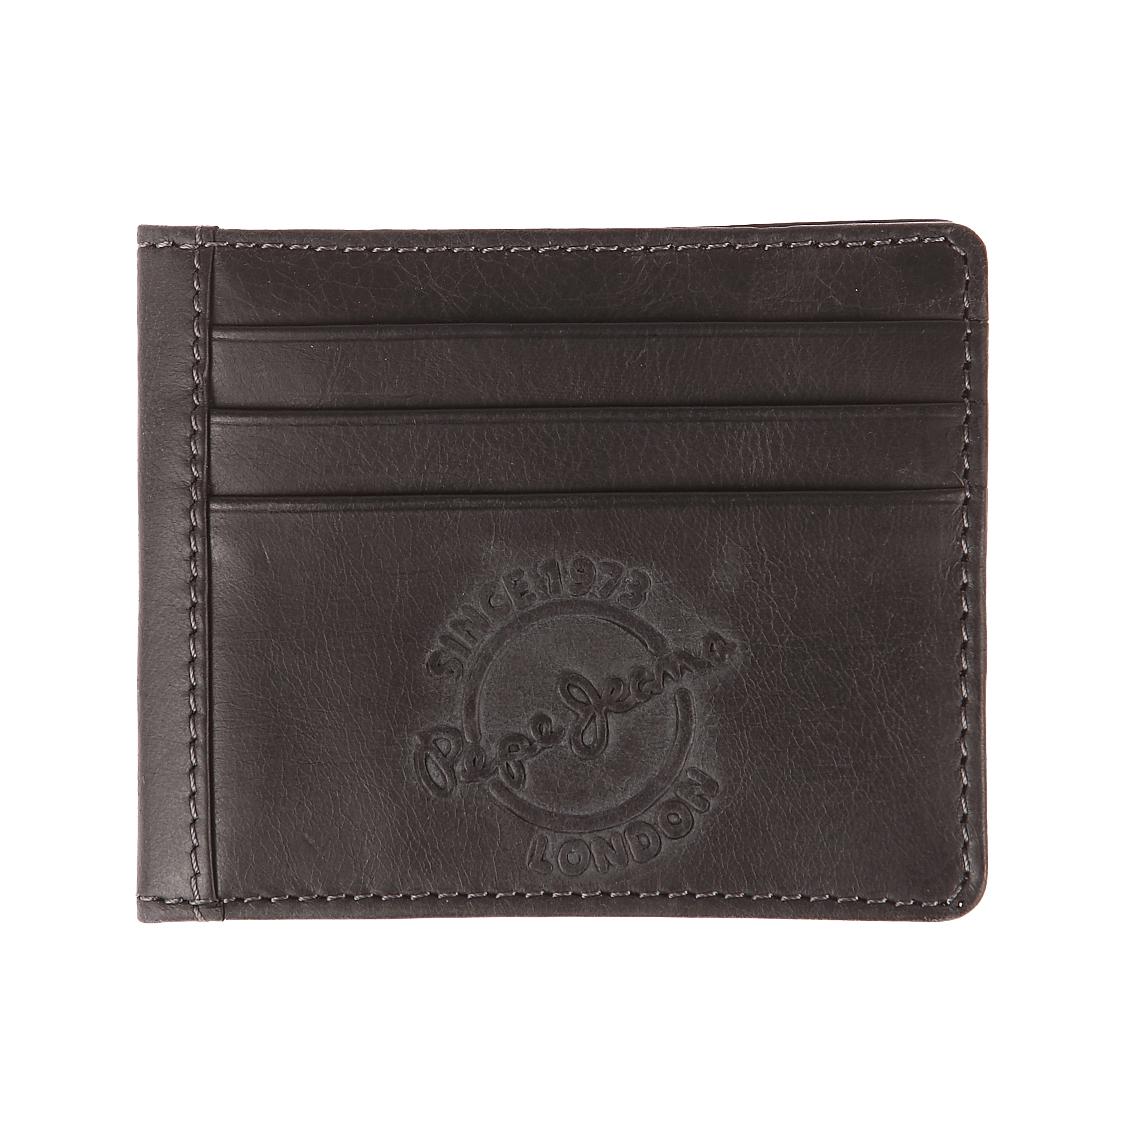 Porte-cartes italien 2 volets  en cuir noir